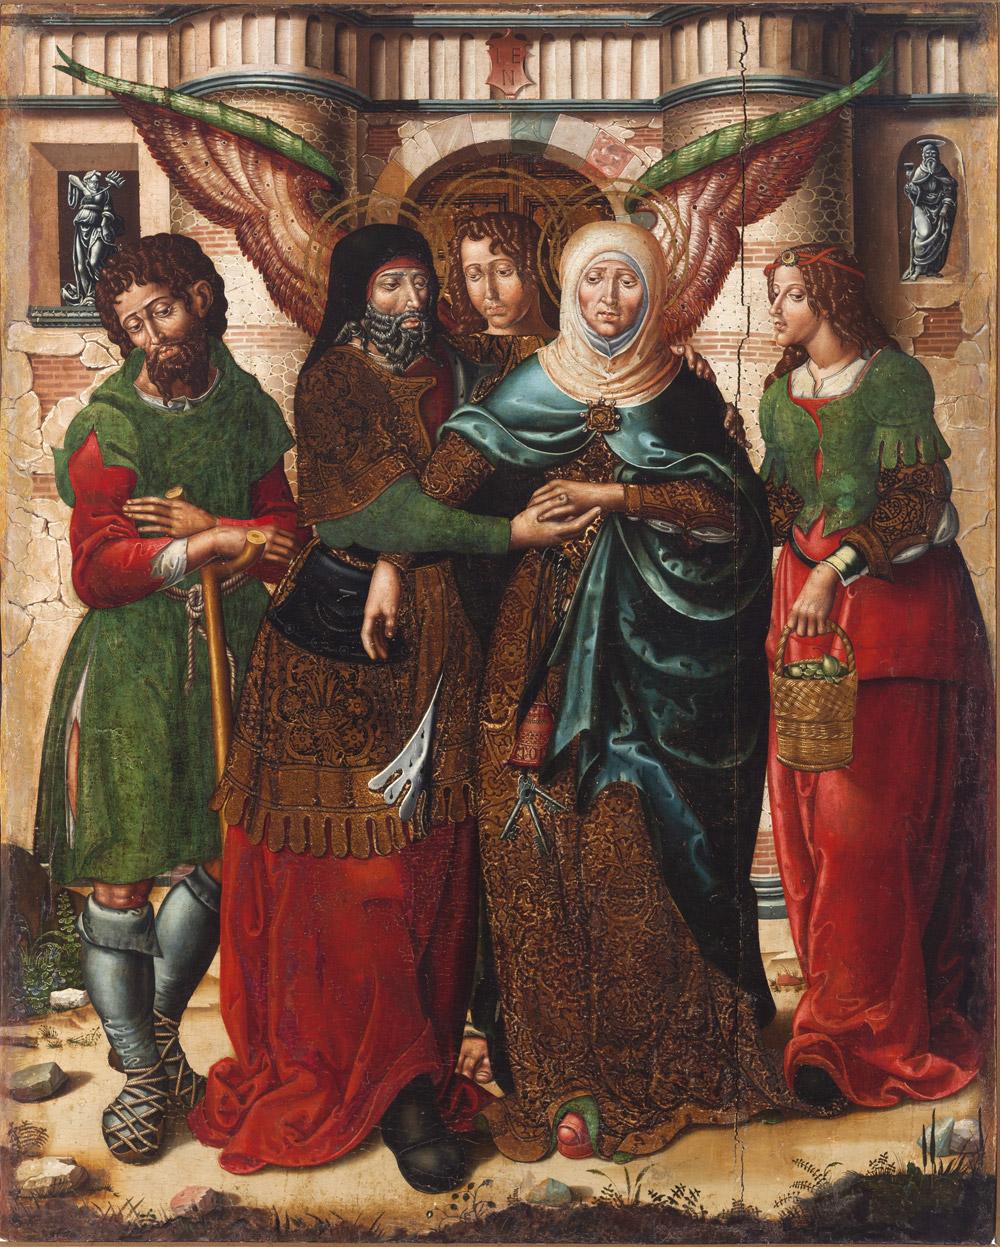 Abrazo en la puerta dorada. Rodrigo de Sajonia (antes Maestro de Sijena). Óleo sobre tabla. 1515-1519. NIG.00001. © Foto Fernando Alvira. Museo de Huesca.